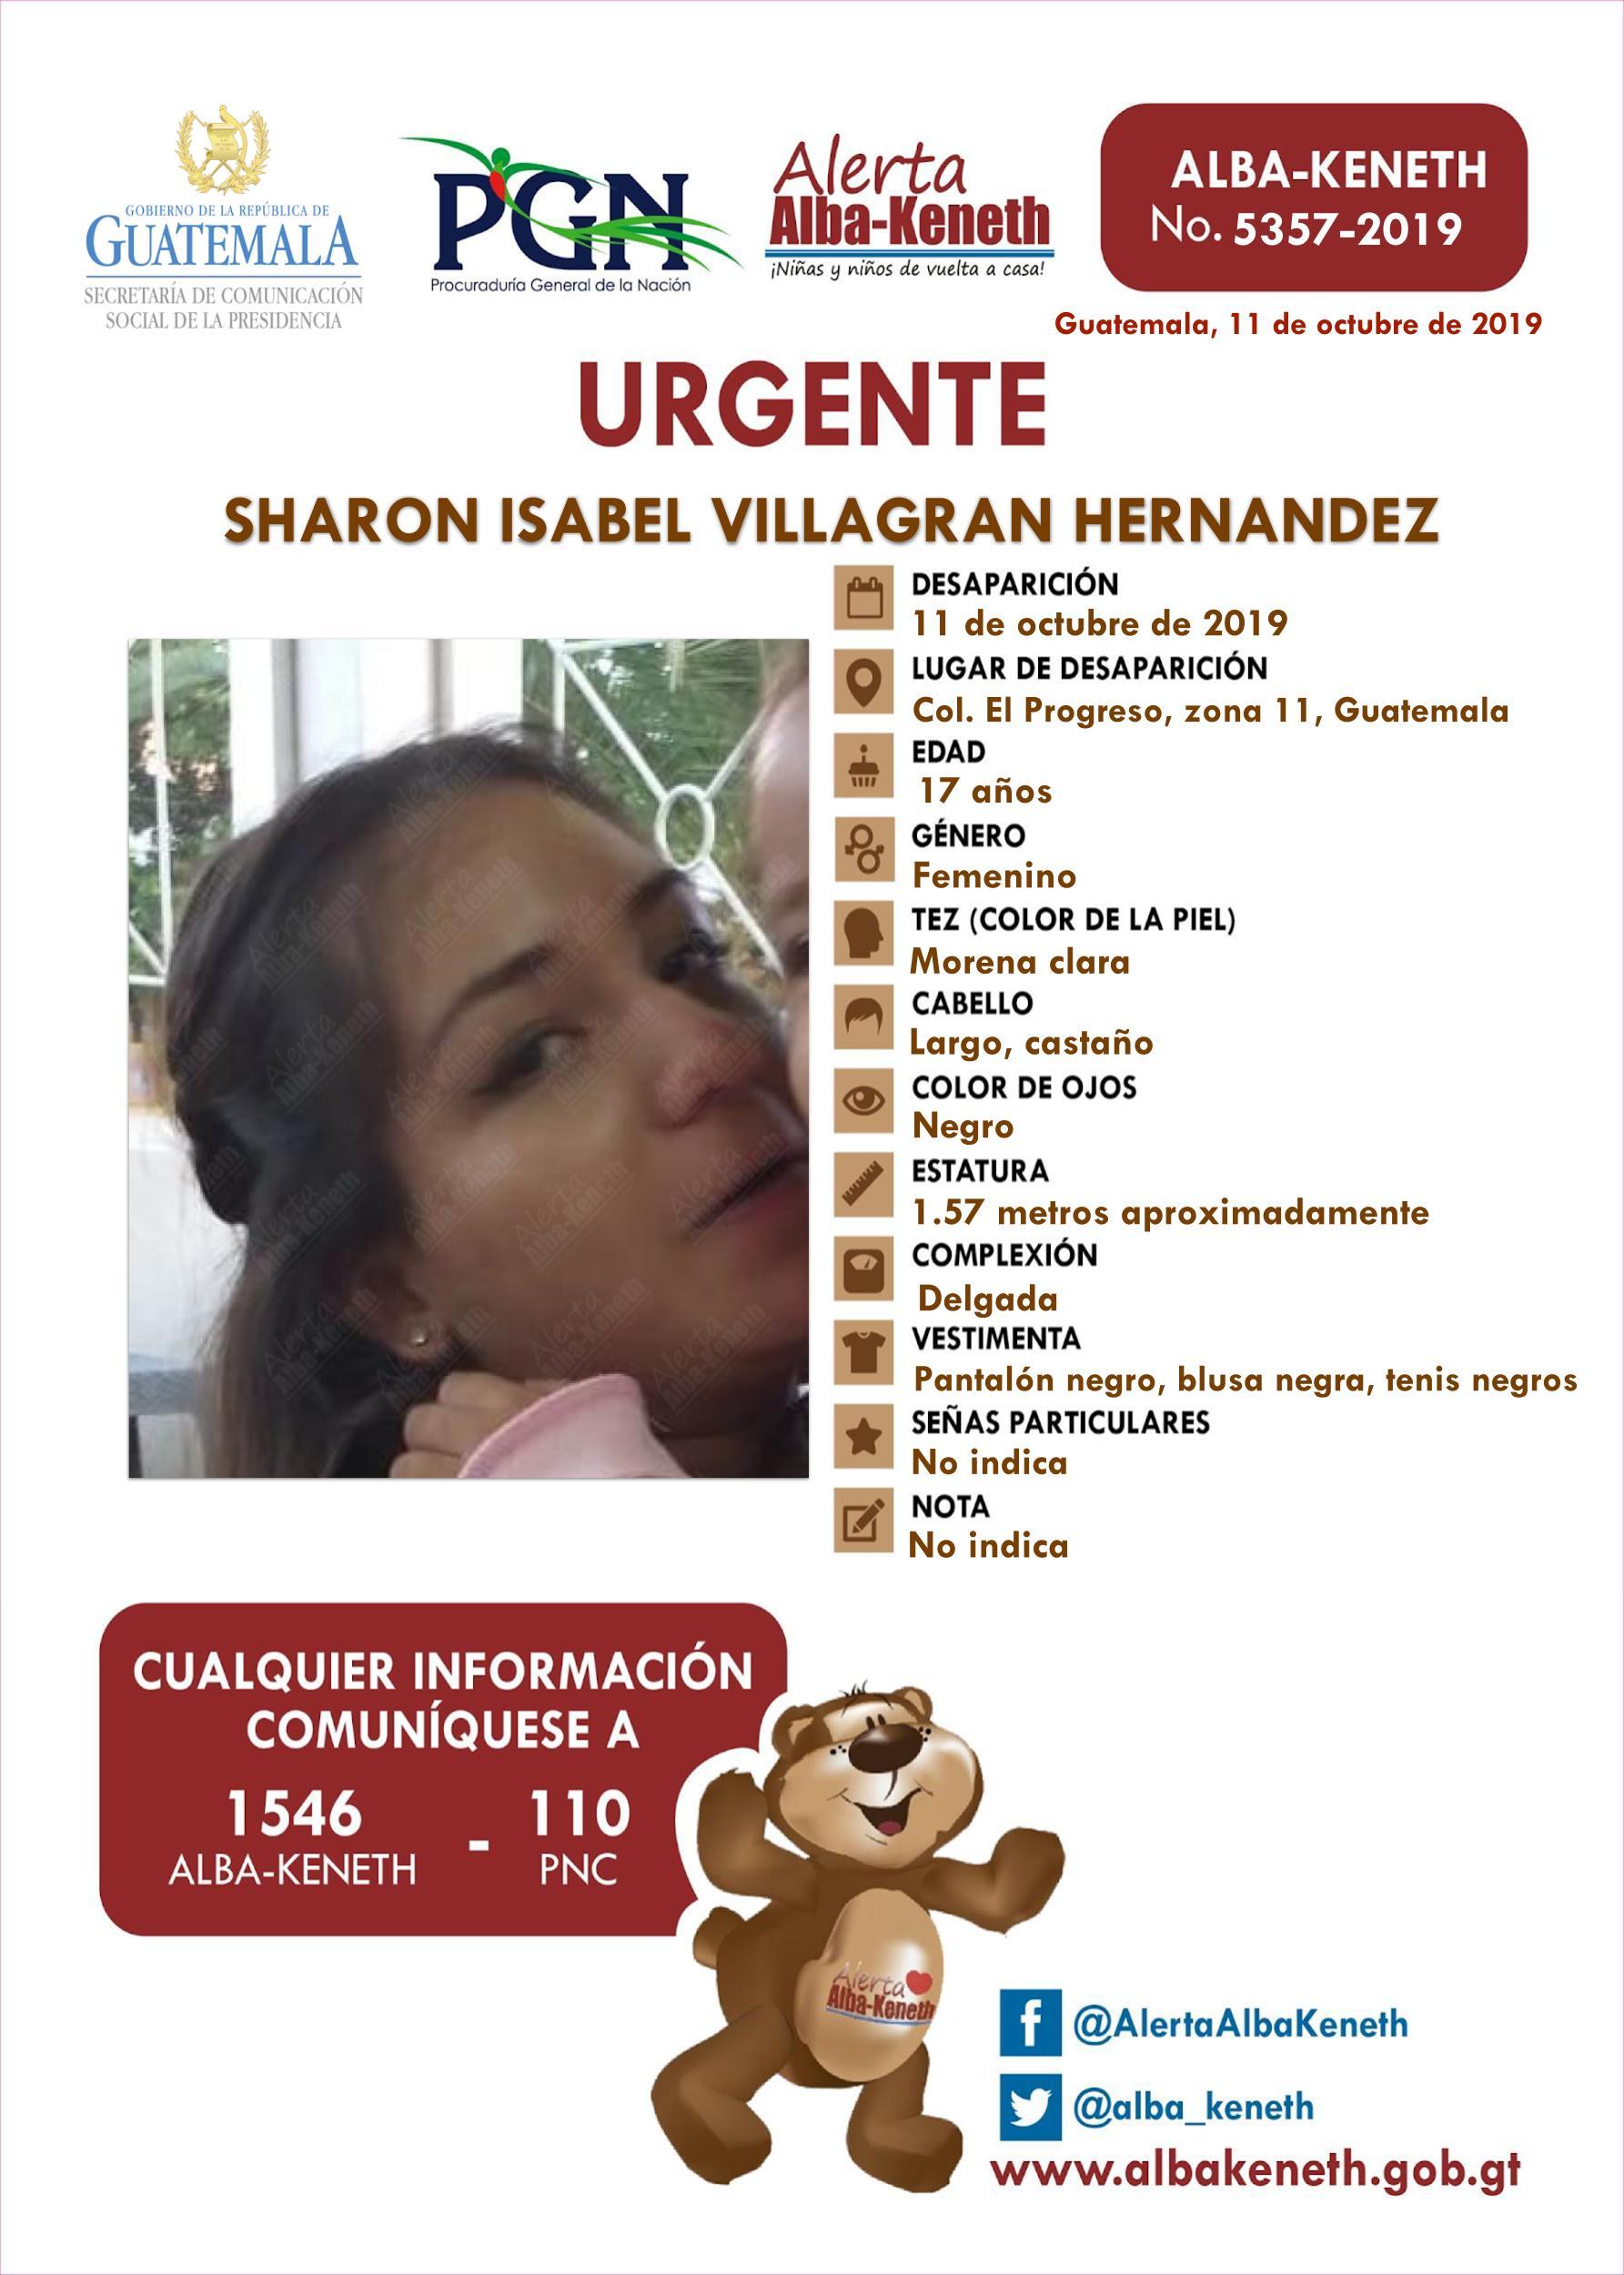 Sharon Isabel Villagran Hernandez